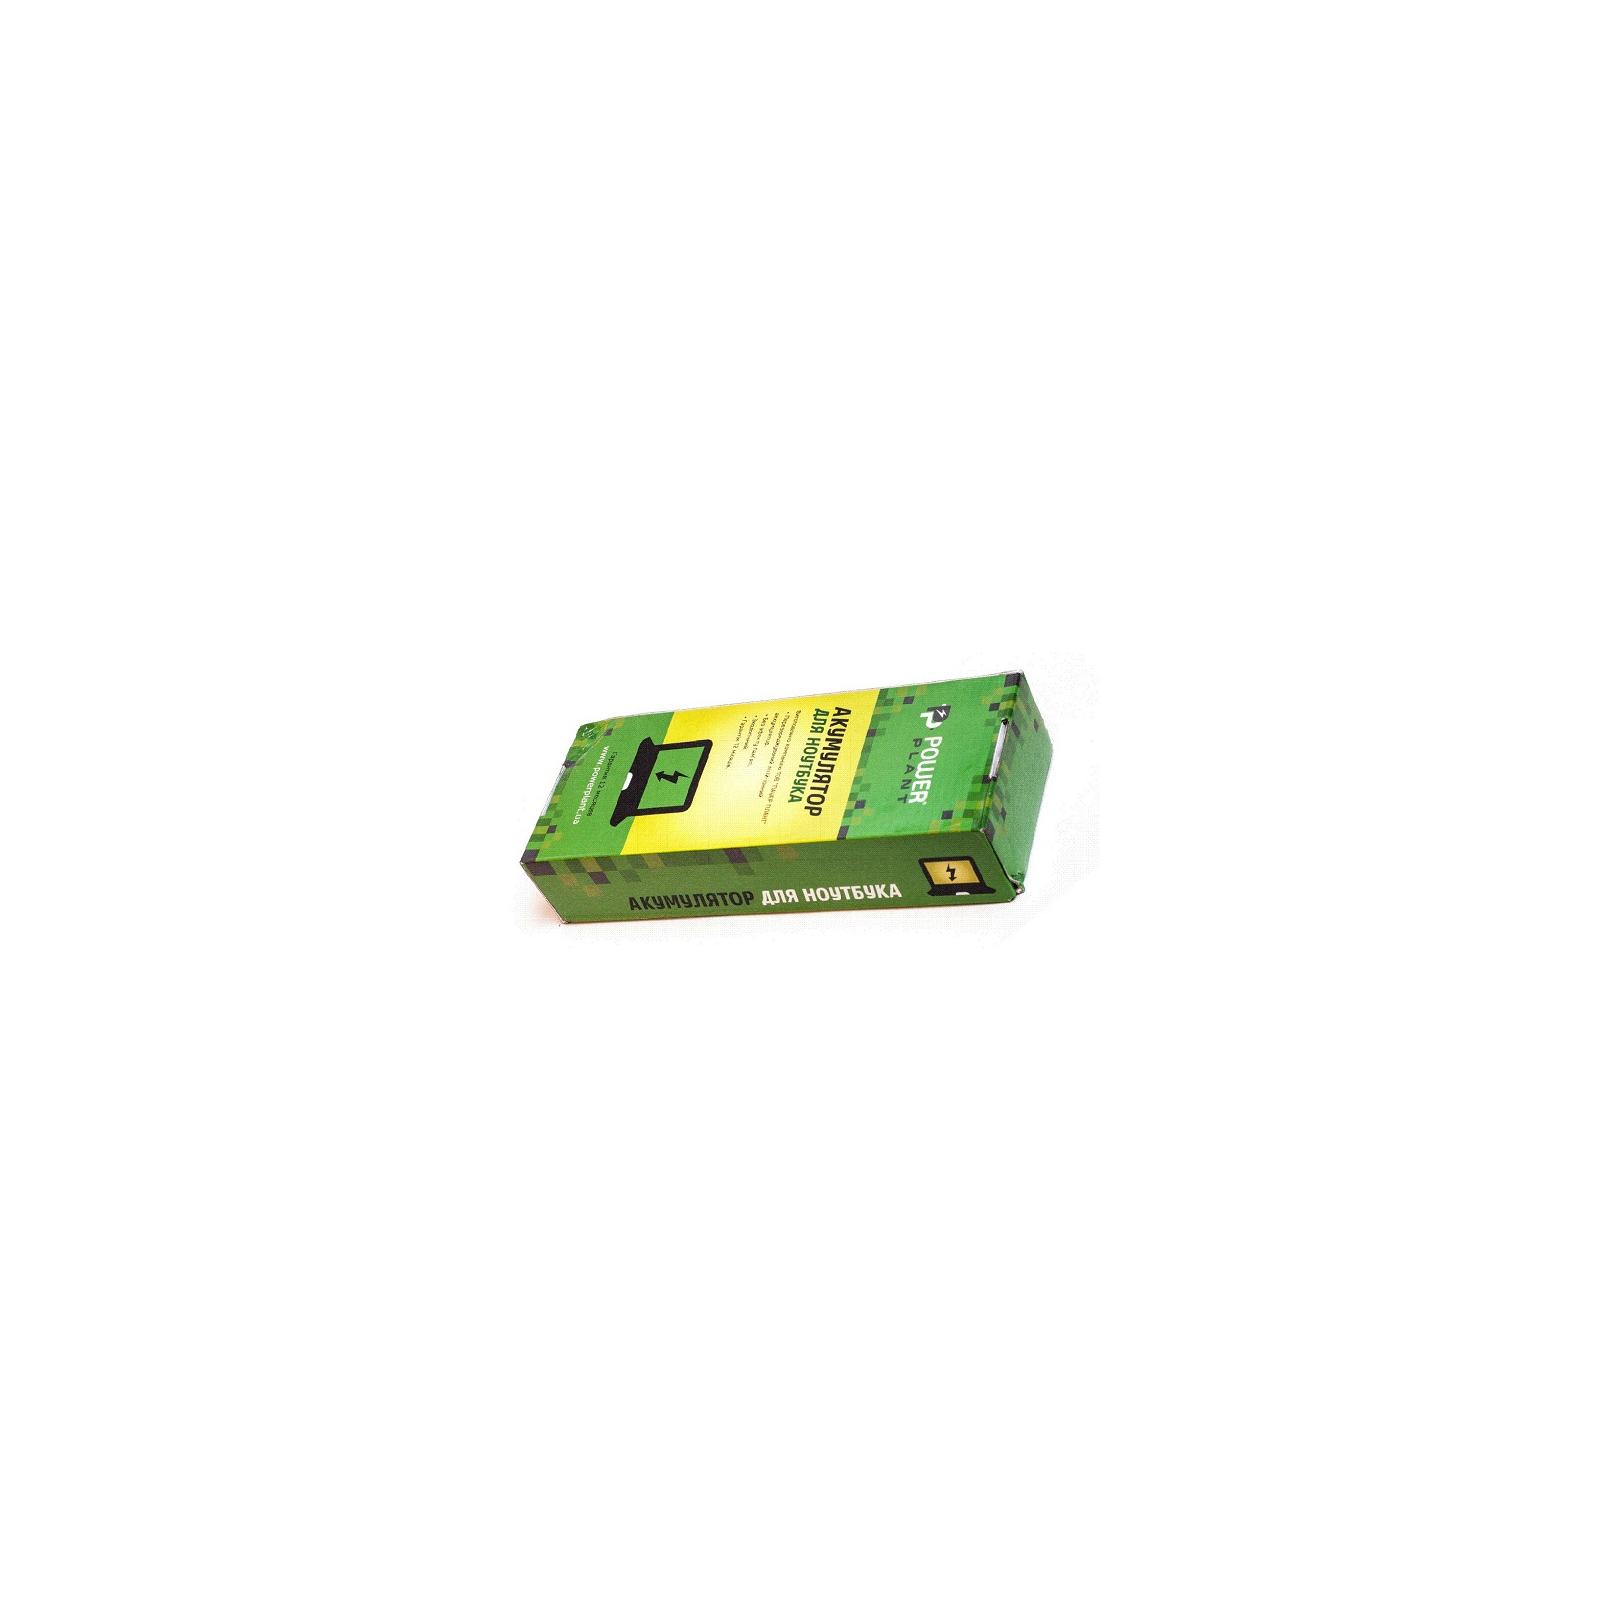 Аккумулятор для ноутбука HP DV3-2000 (HSTNN-IB93, H3128LH) 10.8V 5200mAh PowerPlant (NB00000124) изображение 3